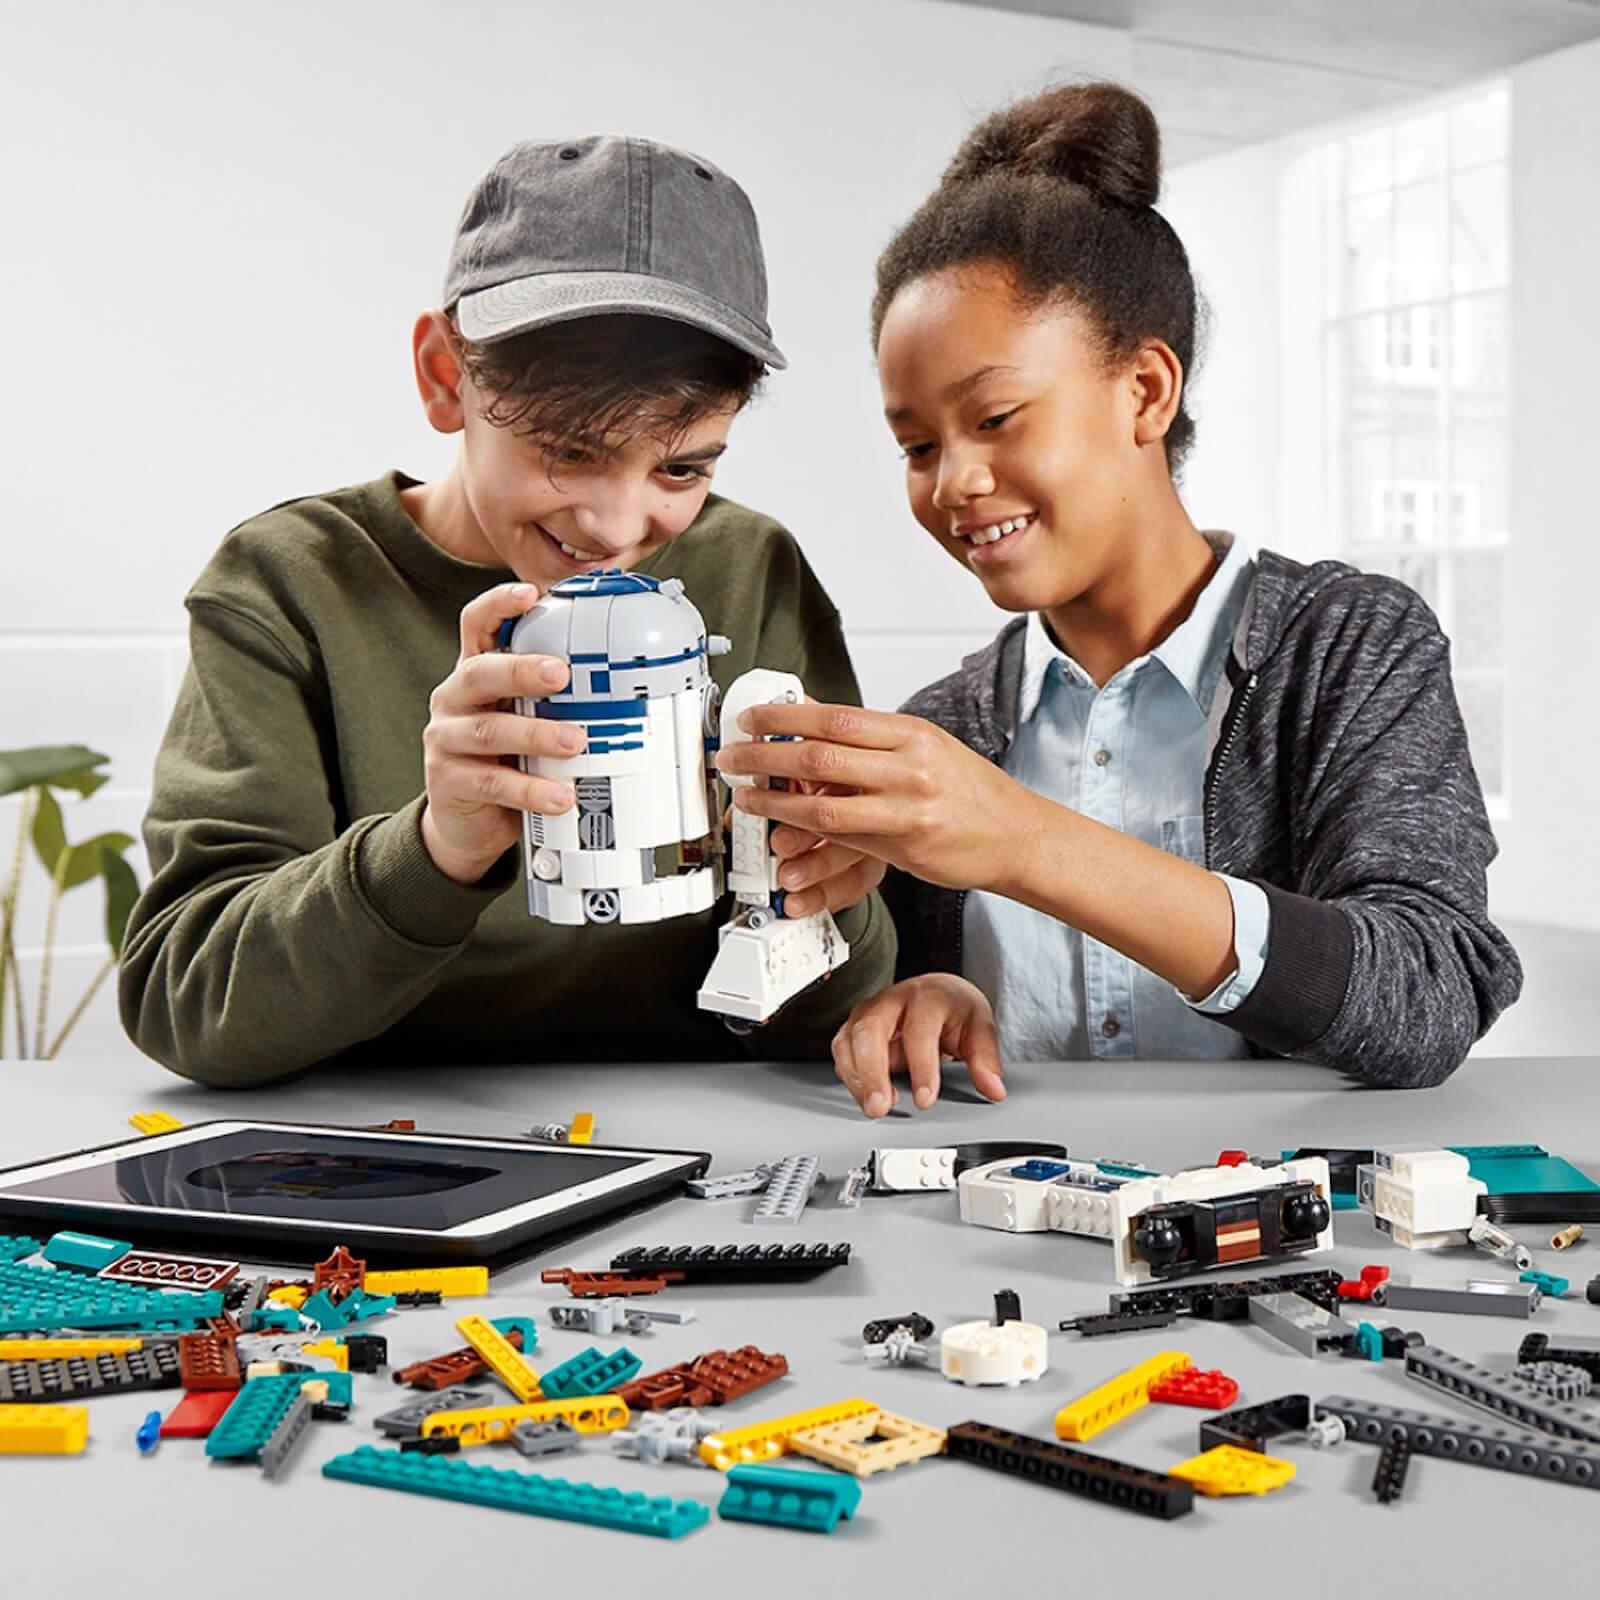 LEGO 乐高 星球大战系列 9月新品 75253 可APP编程 机器人指挥官 积木玩具 优惠码折后£144.99 海淘免运费直邮到手约¥1256